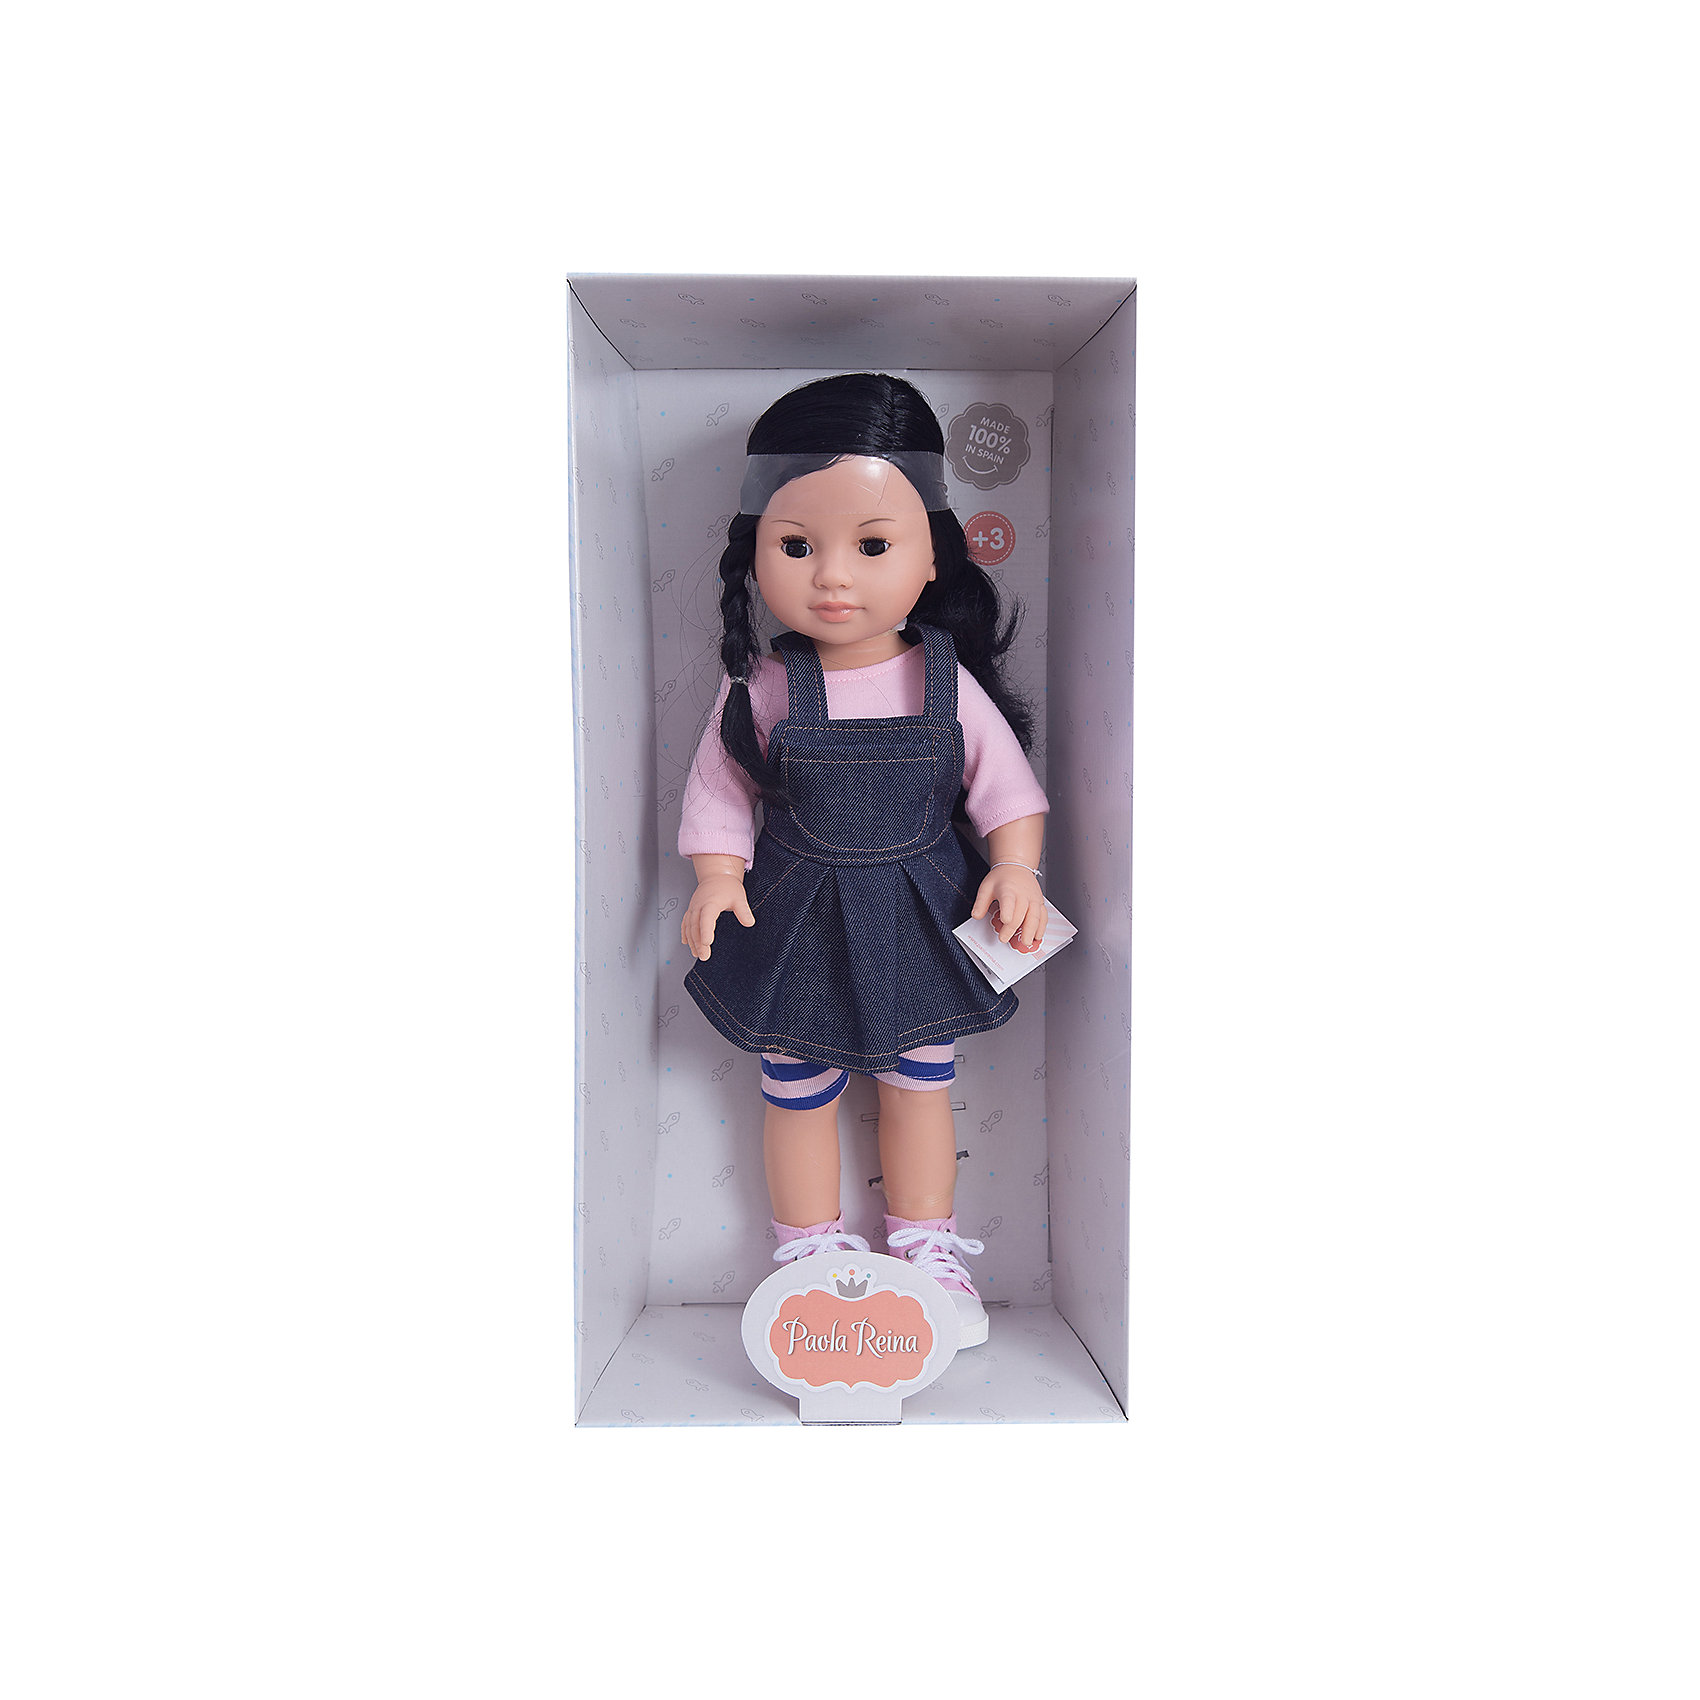 Paola Reina Кукла Лис, 42 см, Paola Reina paola reina пупс без одежды 22 см 31019